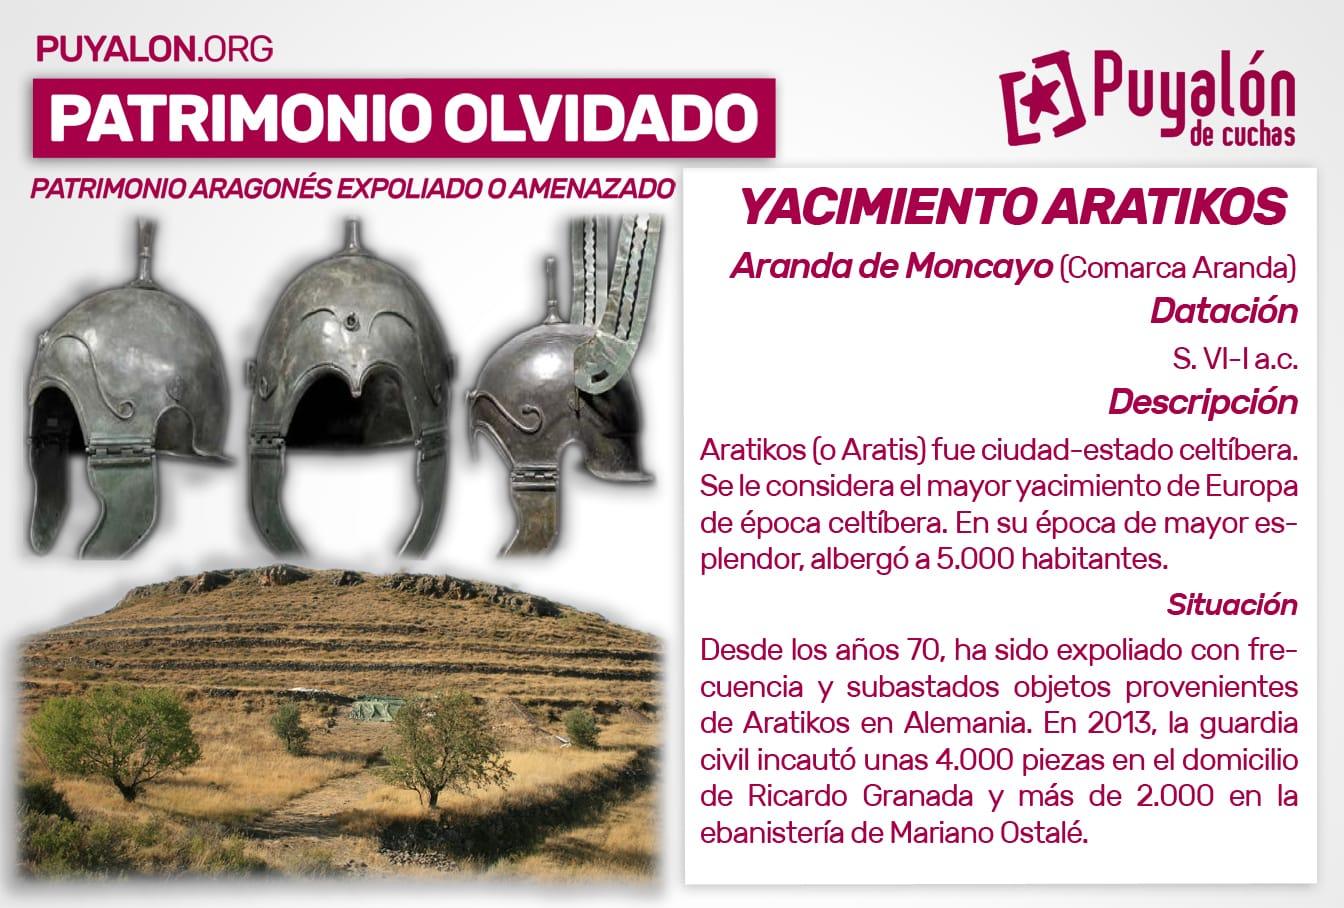 Yacimiento de Aratikos